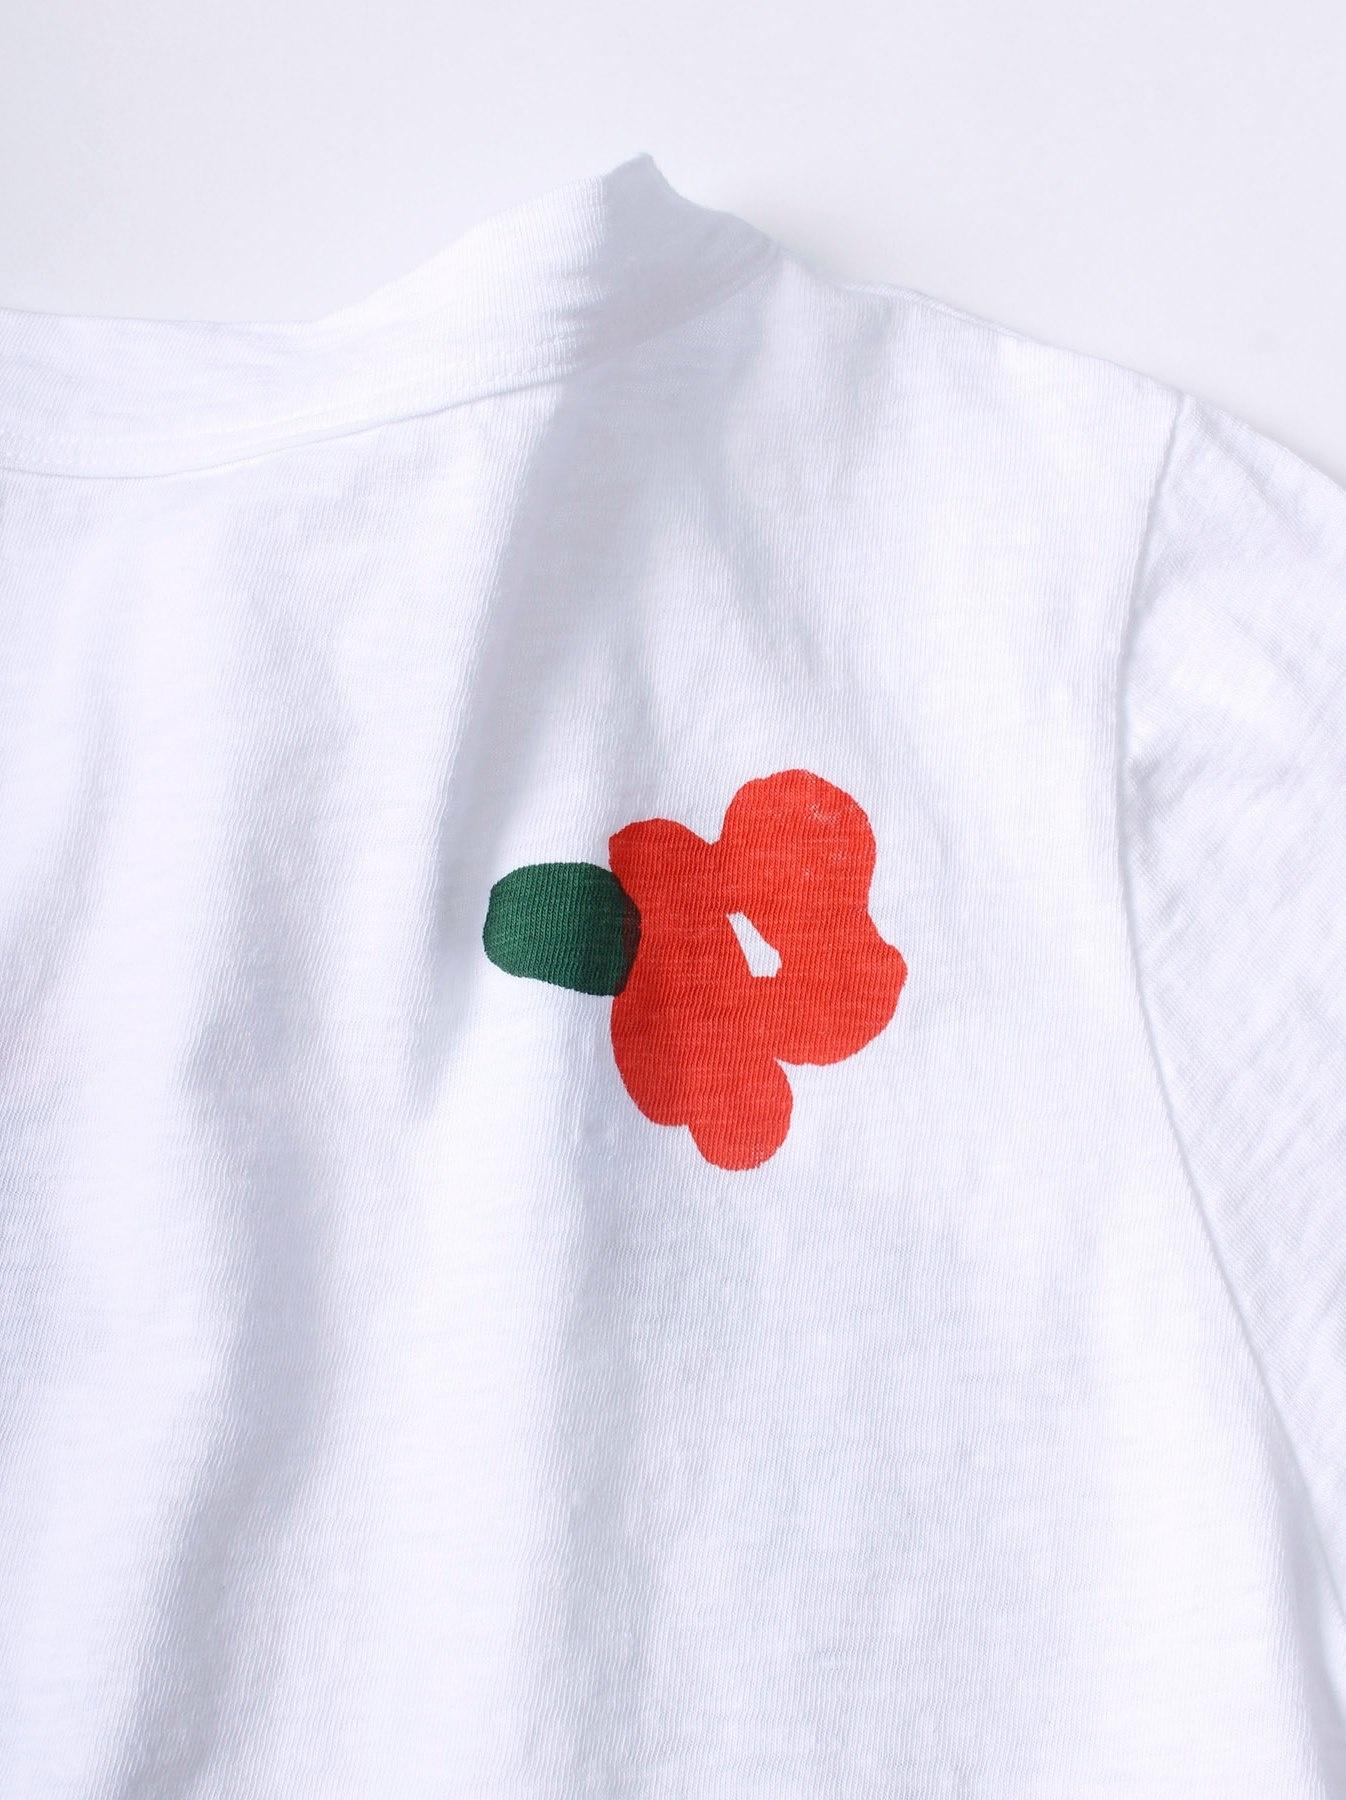 WH 45 Star T-shirt (Flower)-12